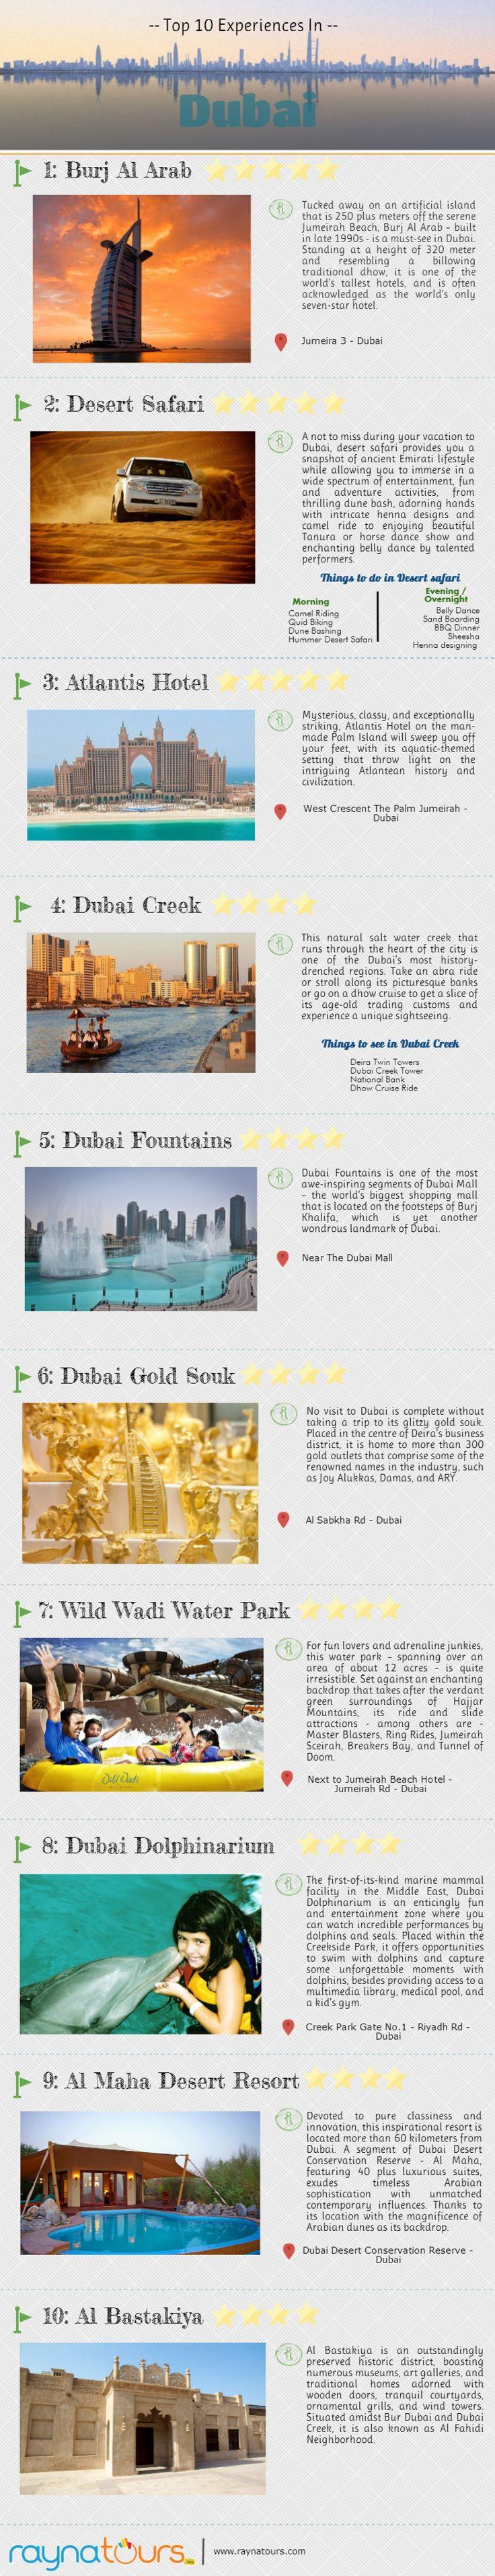 Top 10 Experiences in #Dubai